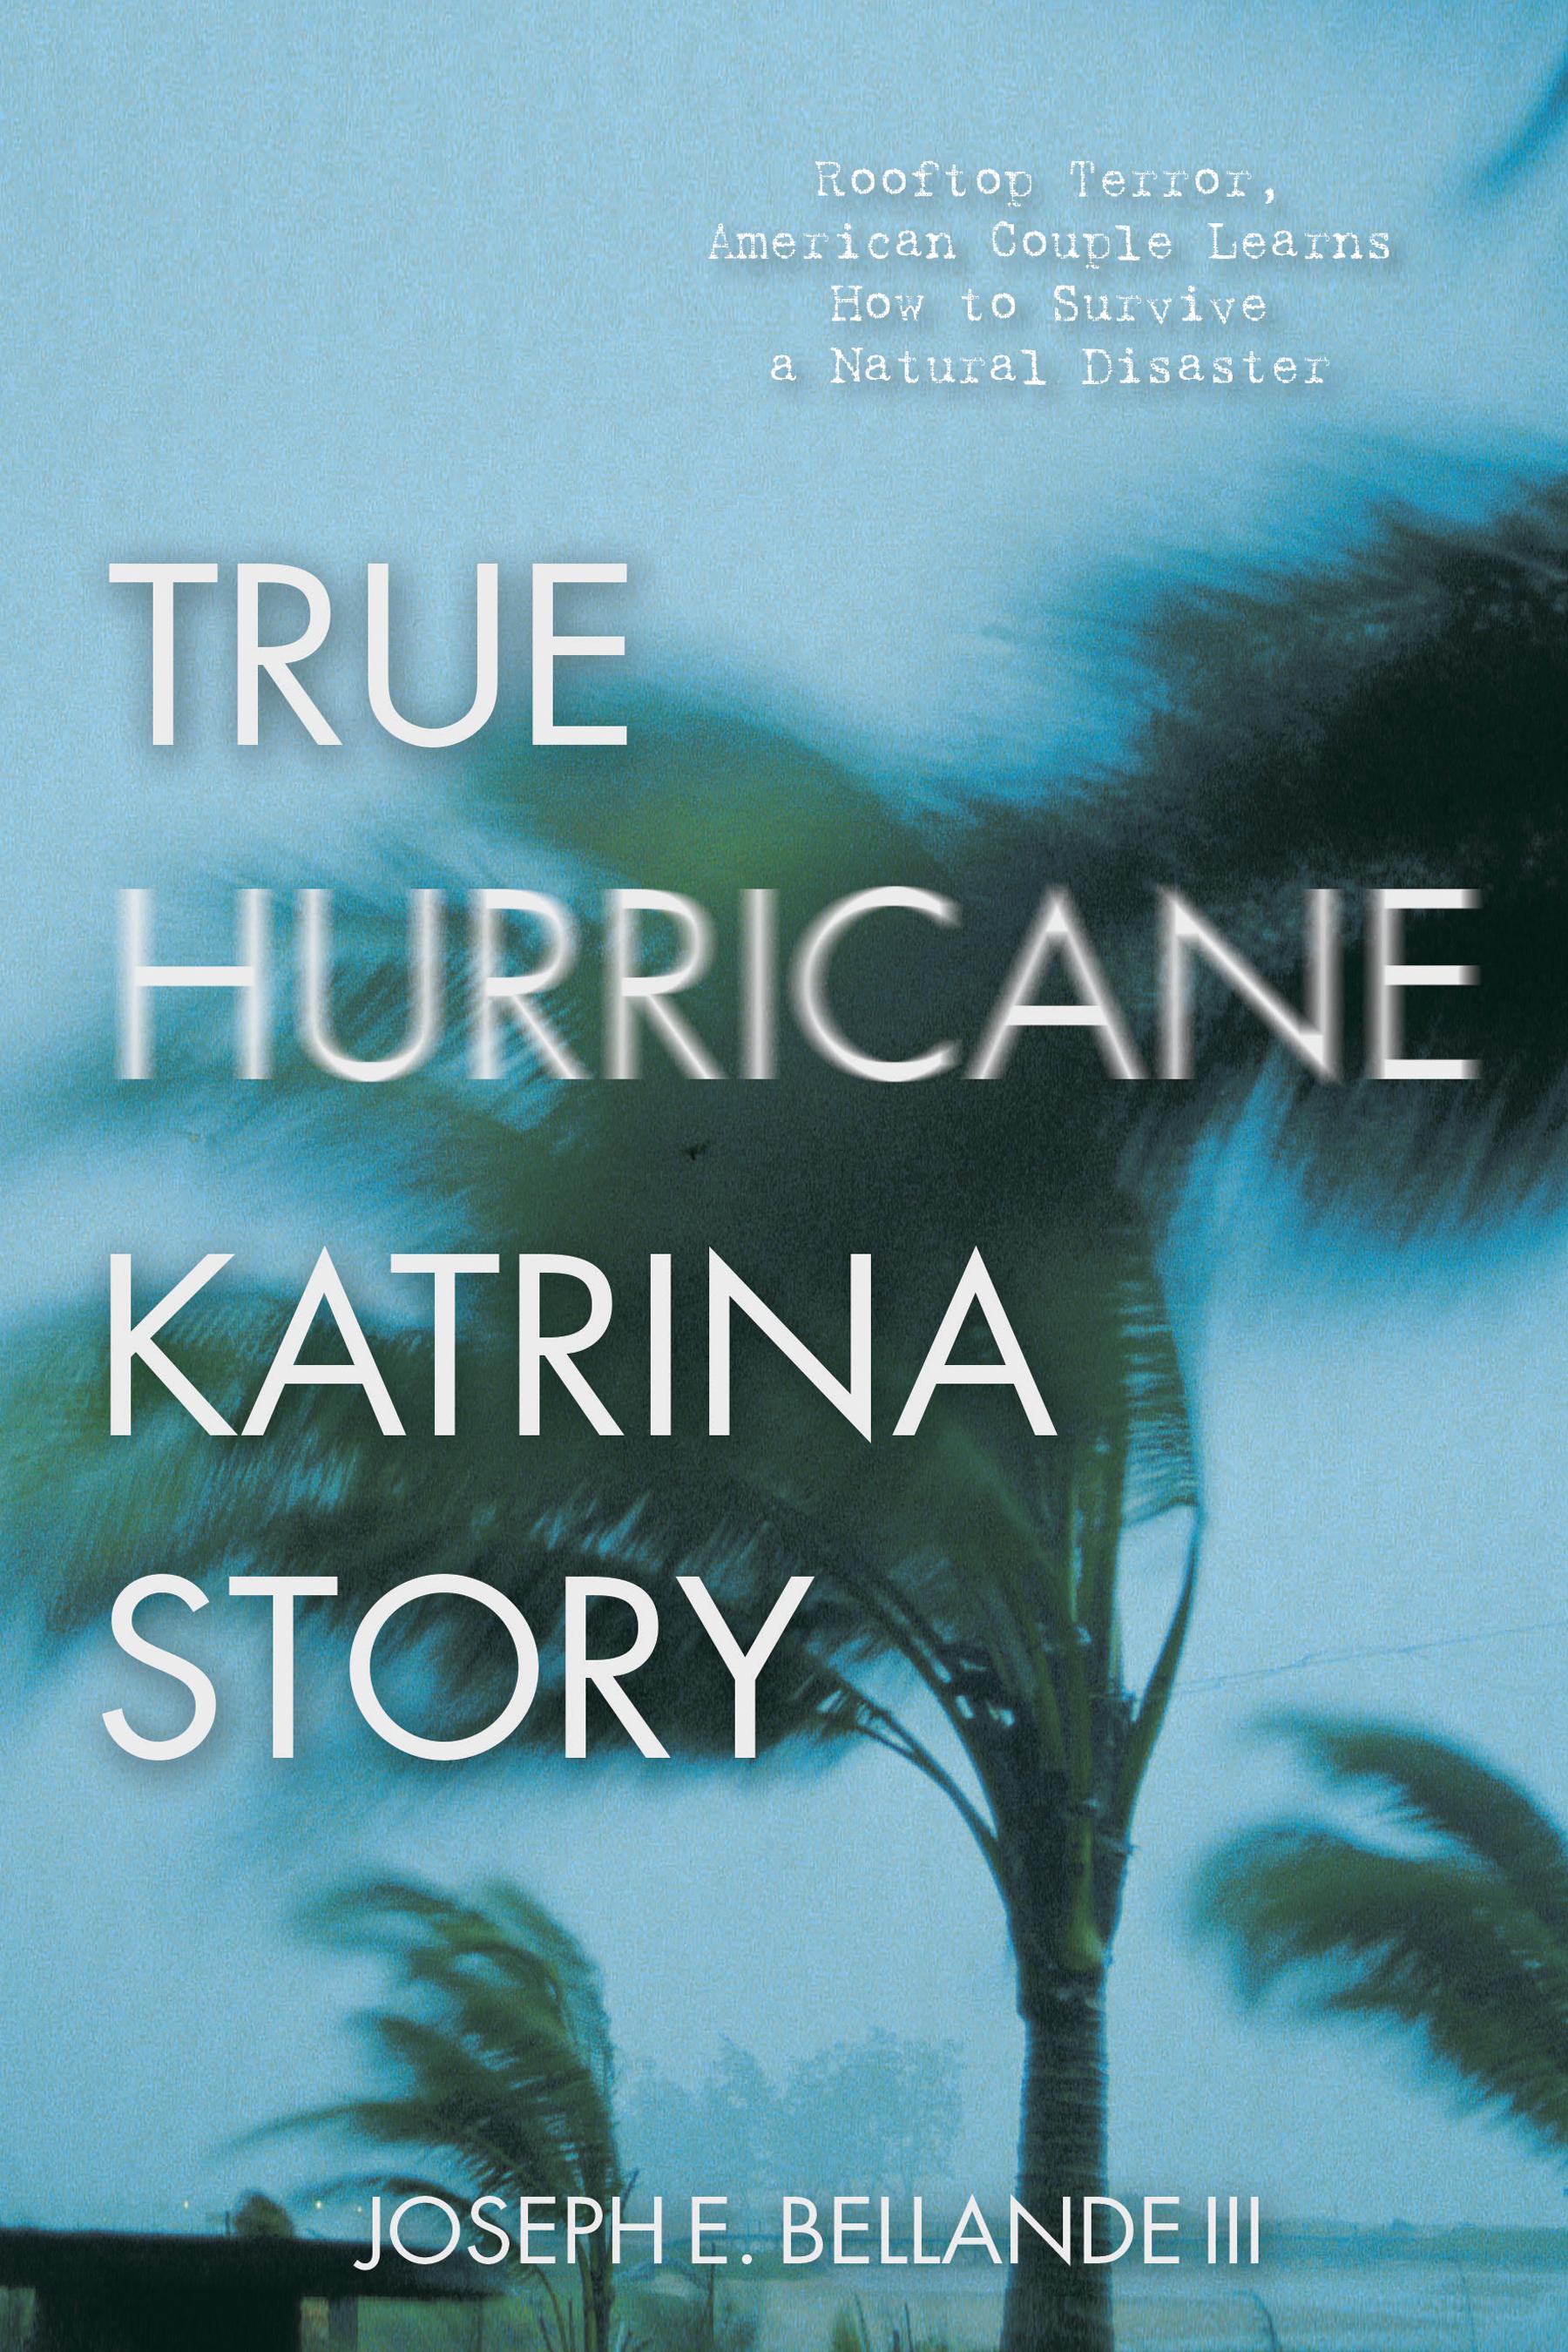 HurricaneKatrina.jpg